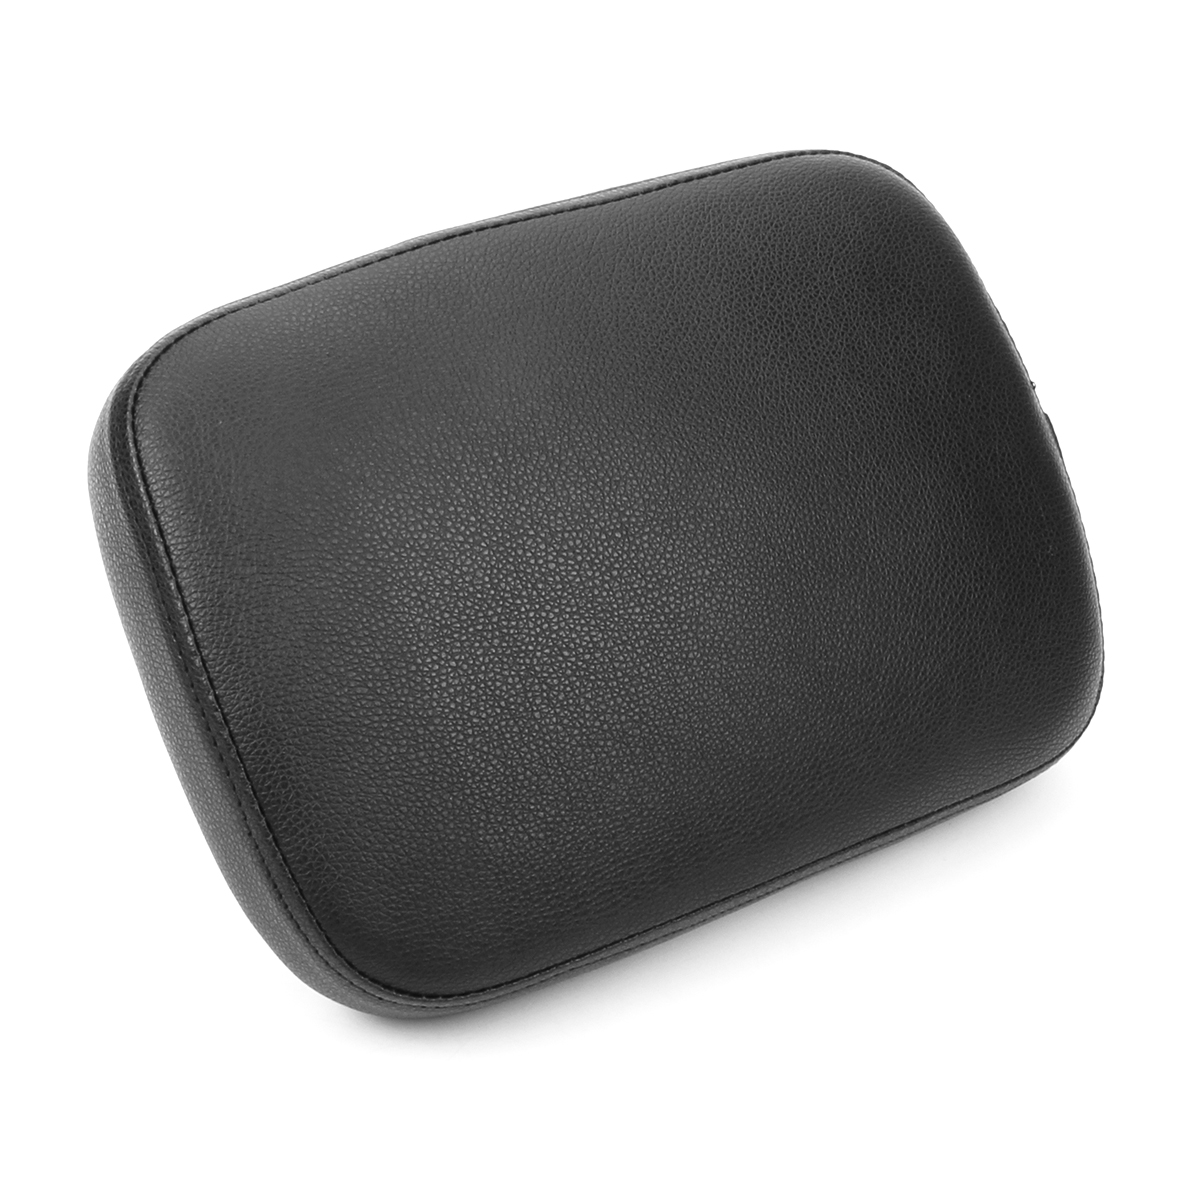 New Fender Mount Passenger Seat Pad Pillion Suction Cup